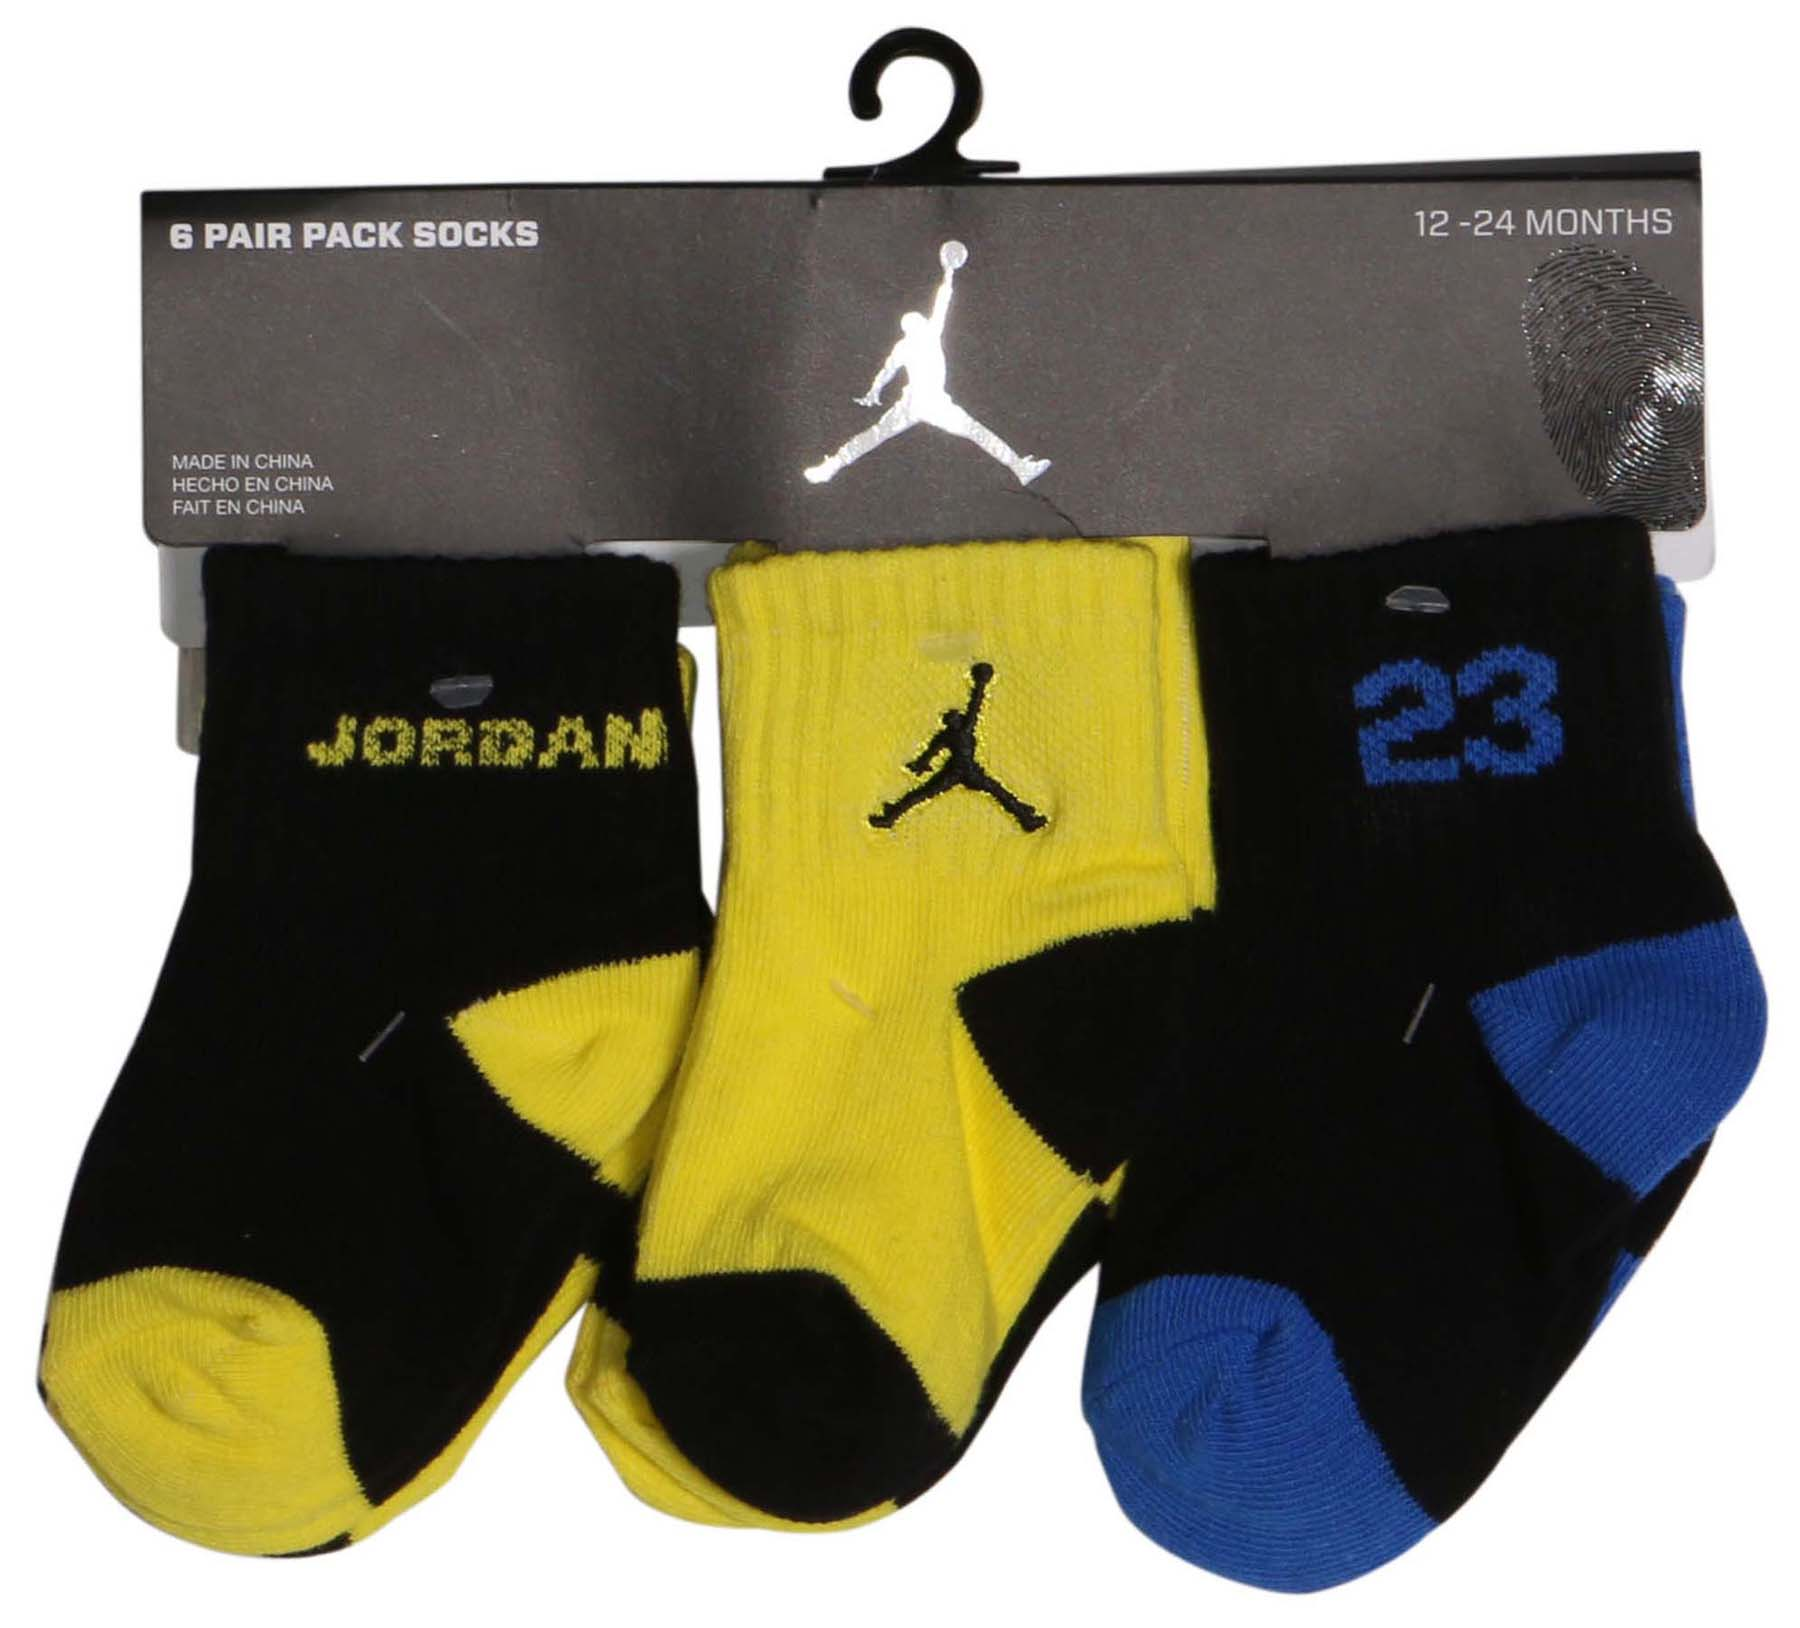 Jordan Infants 12M 24M Nike Legend 6 Pairs Jumpman Socks Blk Yllw